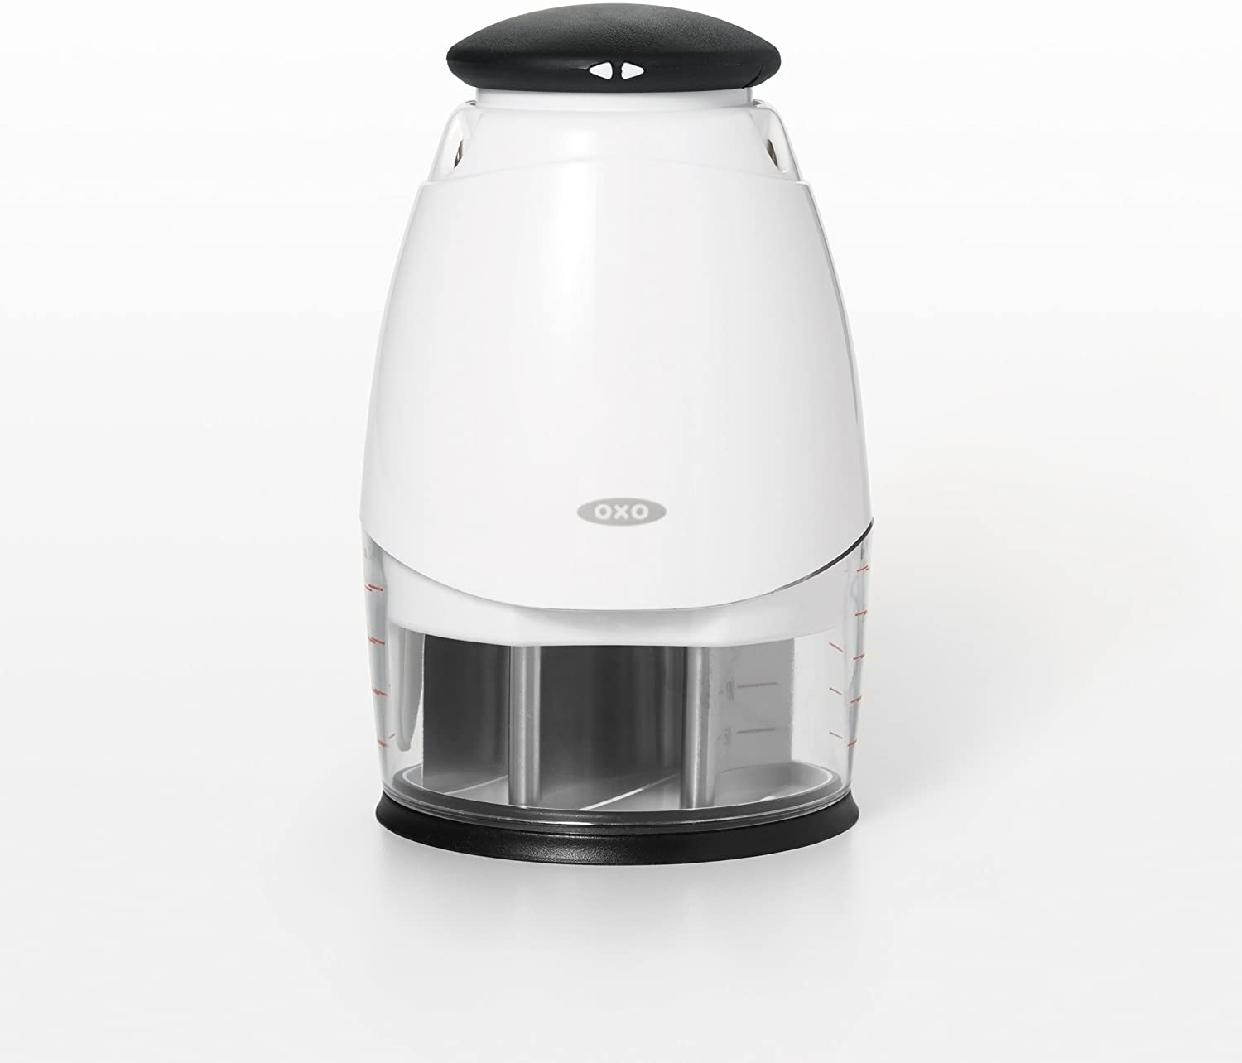 OXO(オクソー)チョッパー 1057959 ホワイトの商品画像11